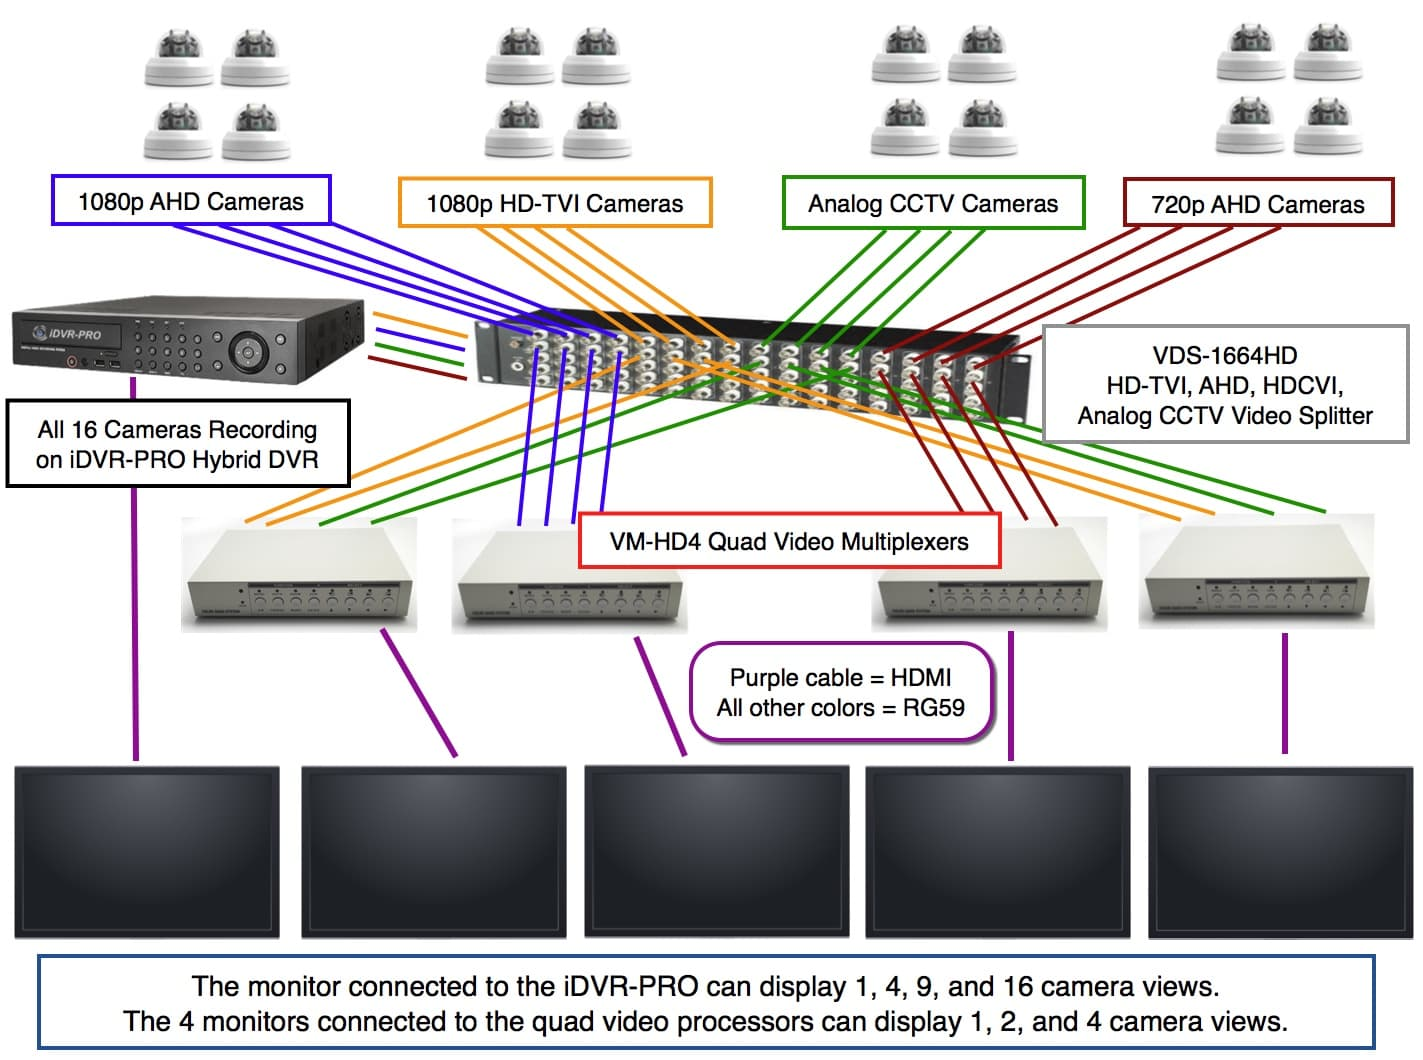 security camera wiring diagram 1995 chevy lumina engine video splitter hd tvi ahd hdcvi analog